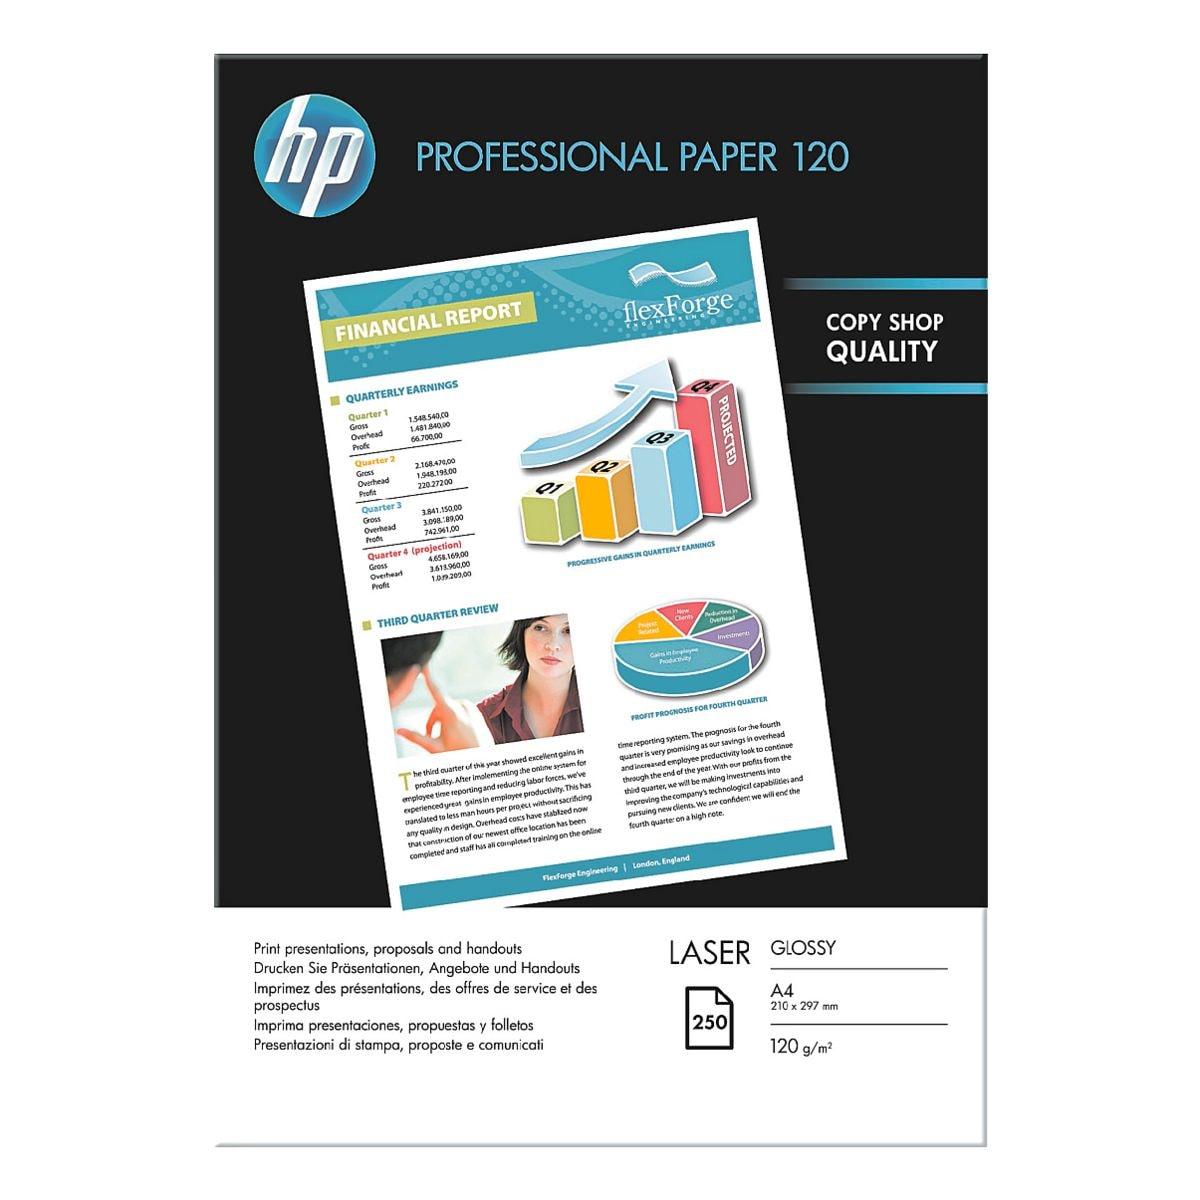 HP Foto-Laserpapier »HP Professional Paper 120« A4 120g